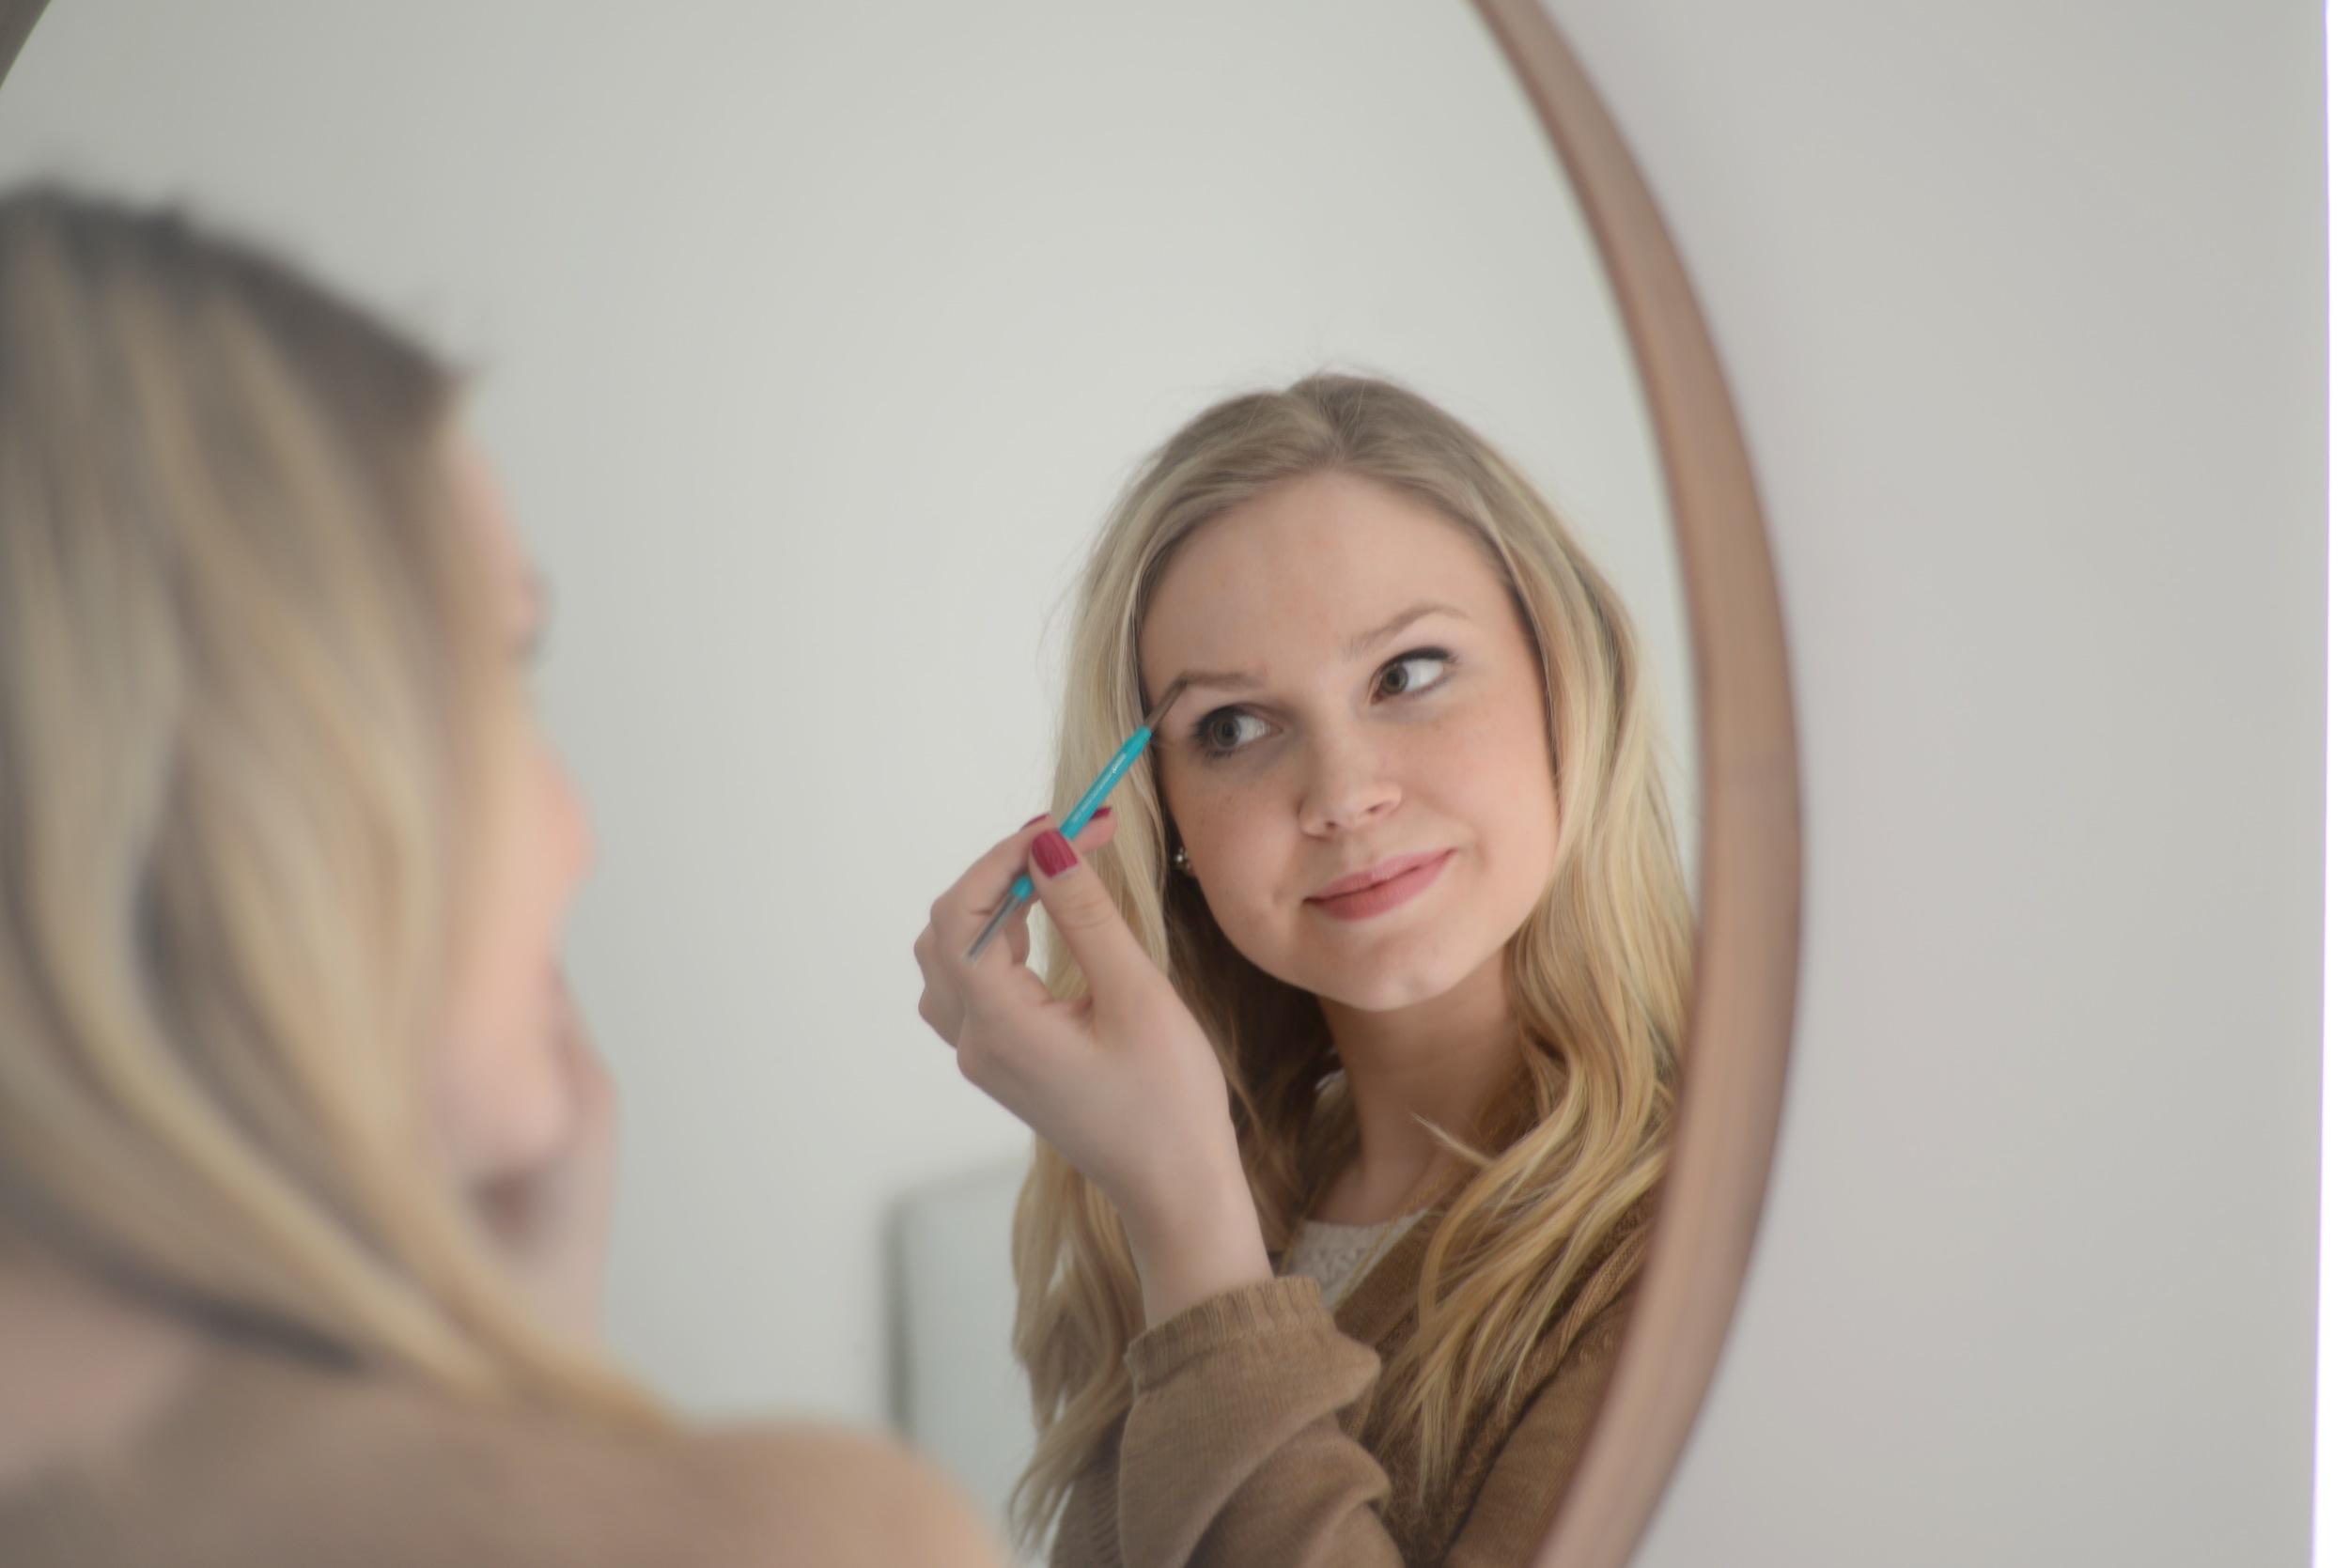 vegan and toxin free cosmetics